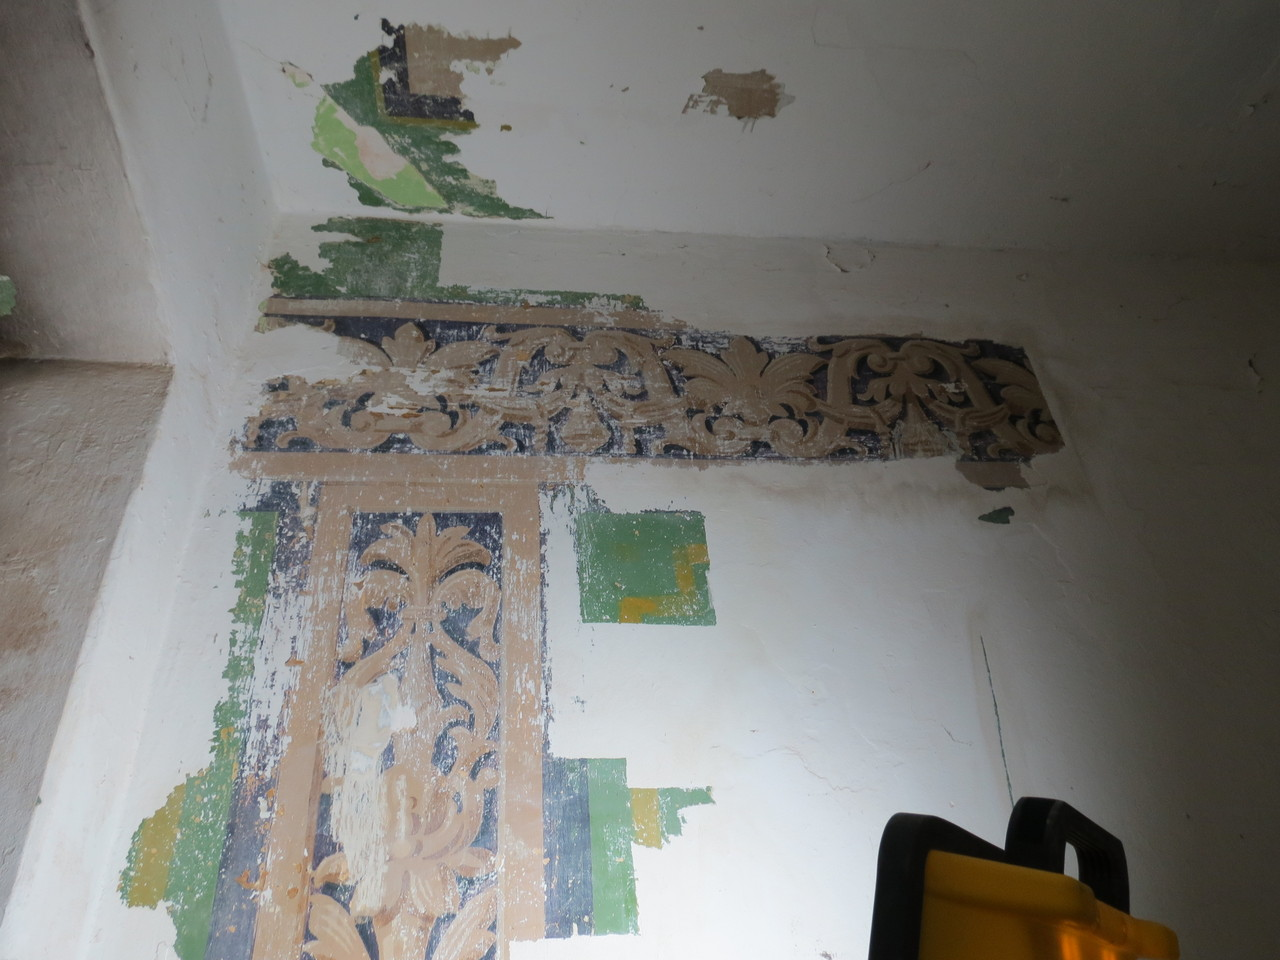 Treppenhaus Zwingerstr. Halle Befunduntersuchung Wandmalerei